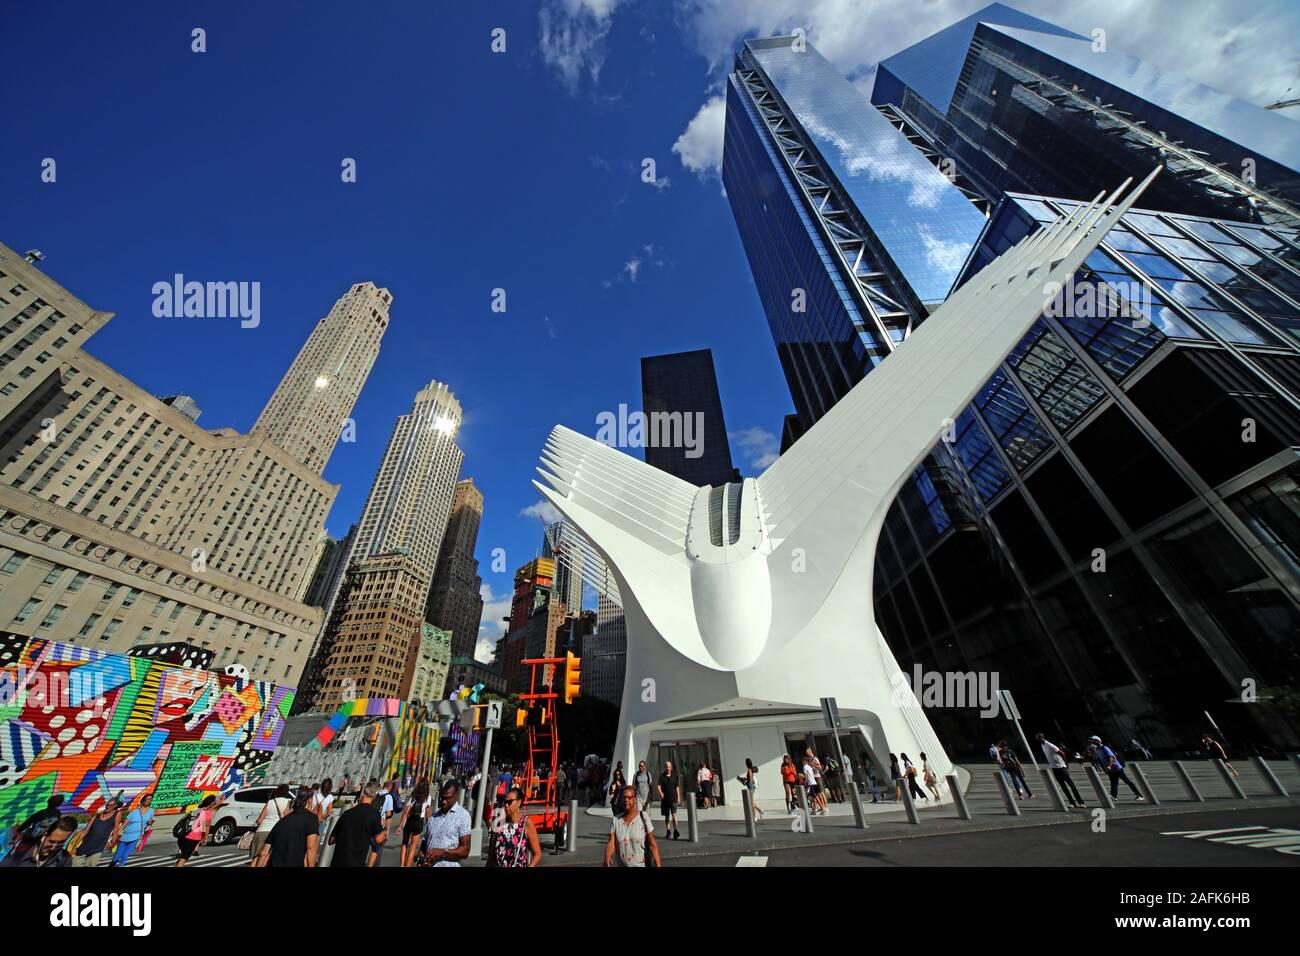 Dieses Stockfoto: One World Trade Center, Manhattan, New York City, NY, USA, Nordamerika - umgebaut 2016 - 2AFK6H